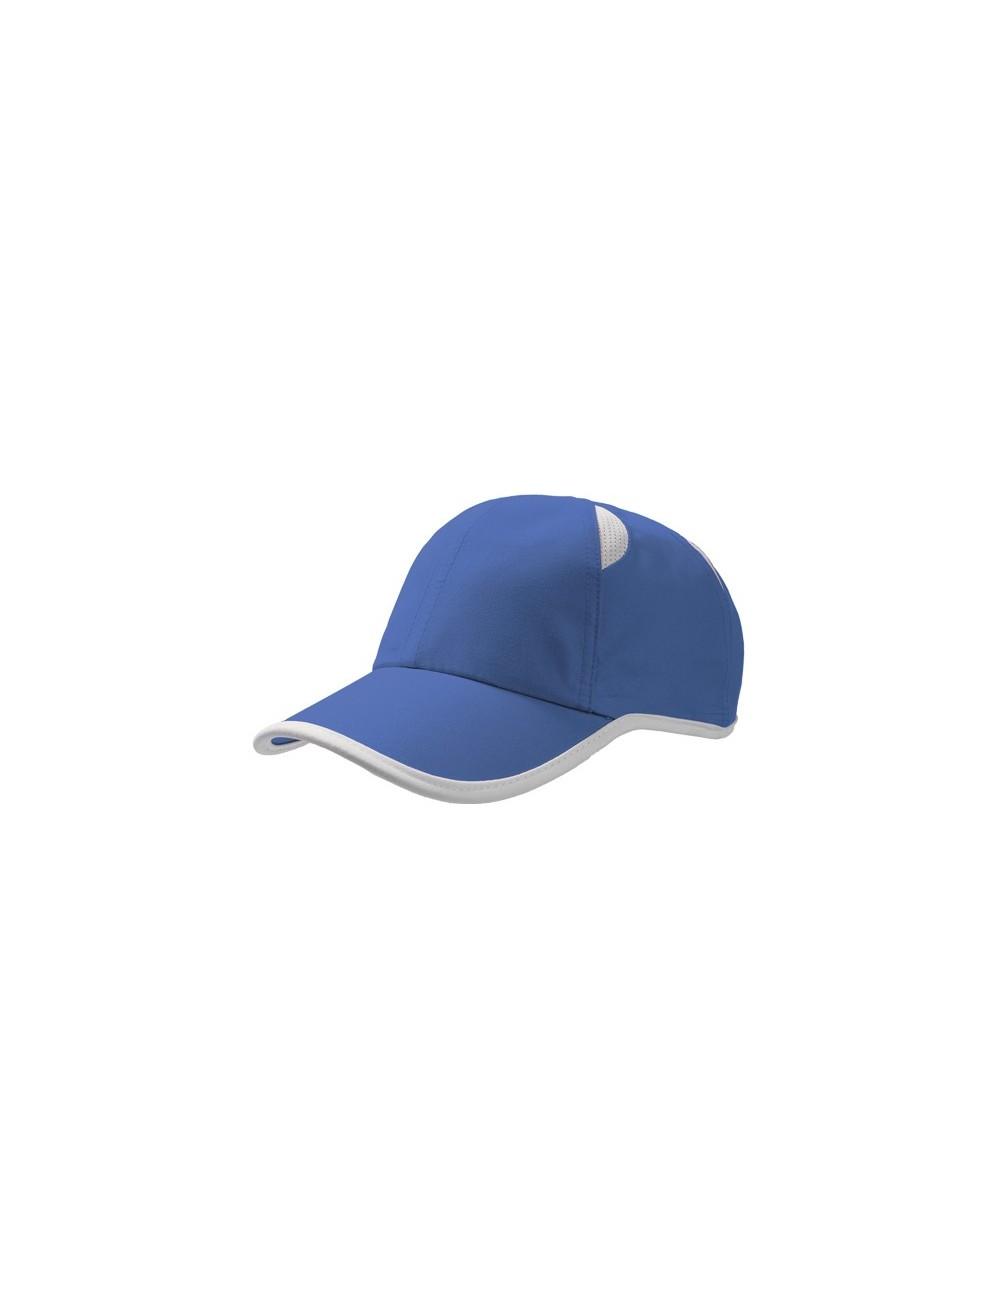 851 Gym καπέλο